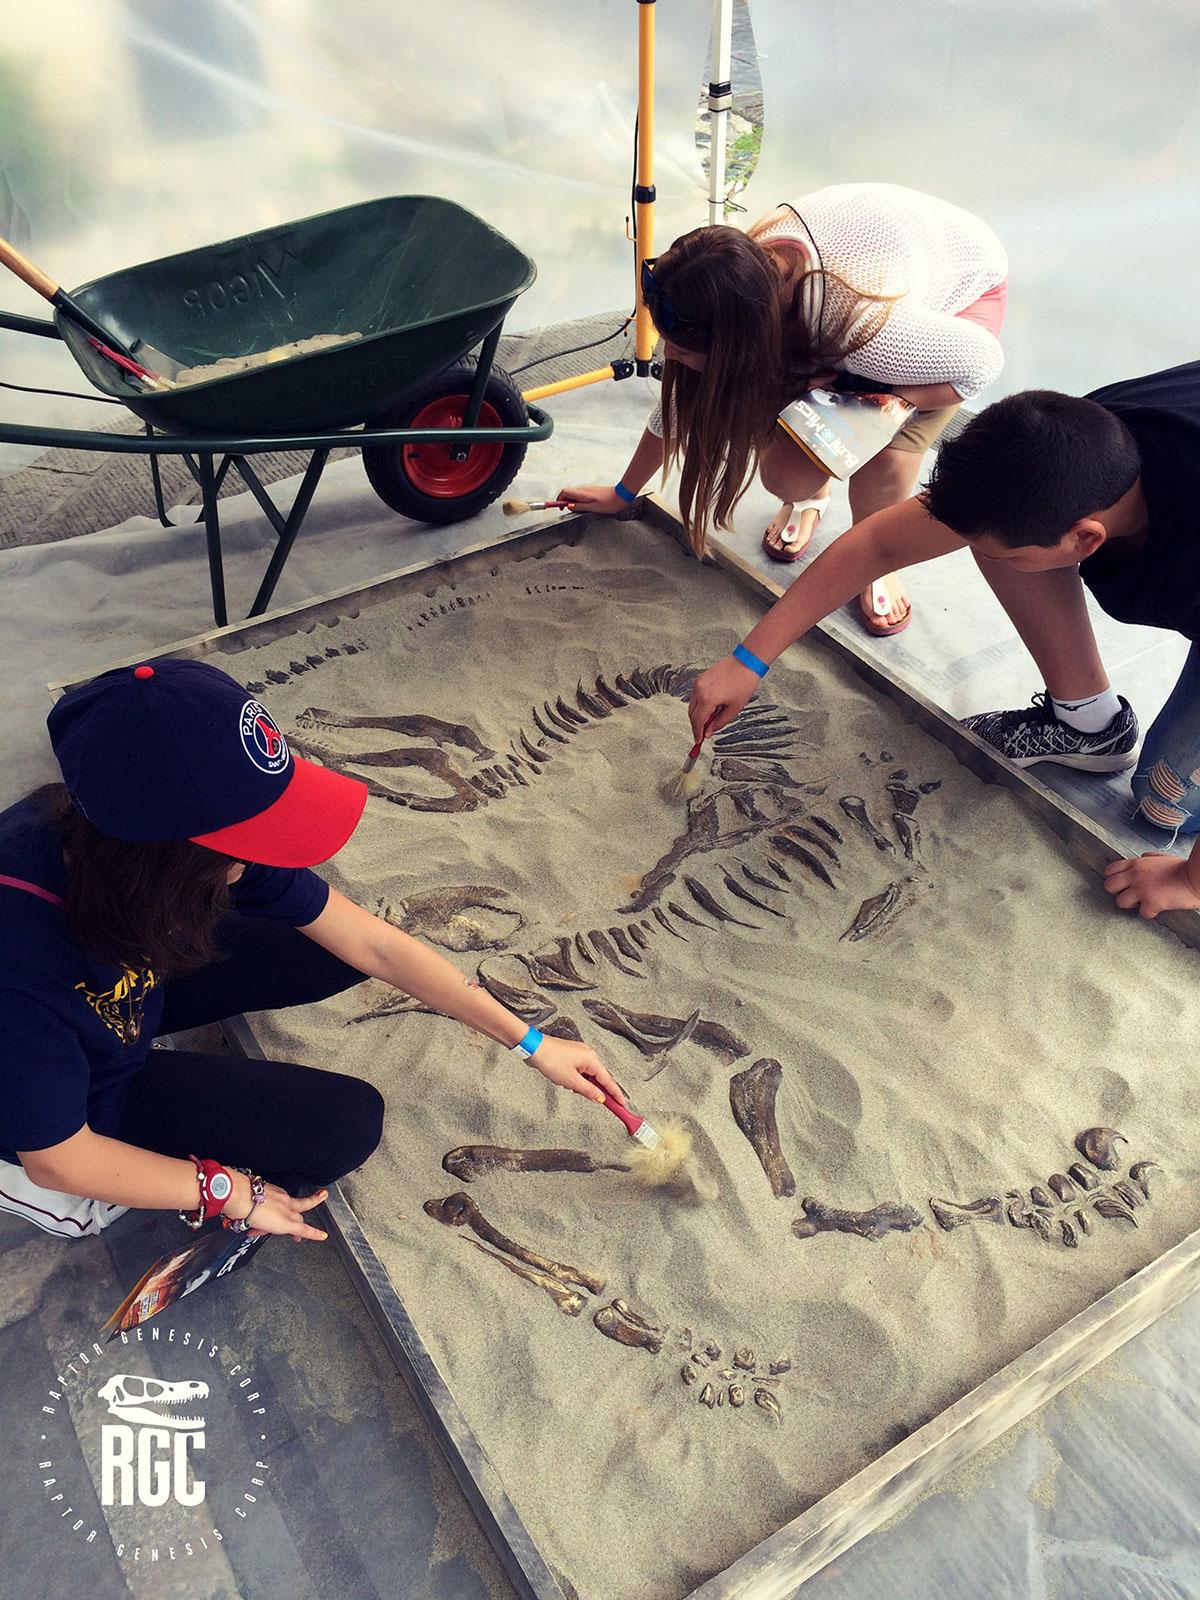 Dinosaur Event educational Students raptor museum Entertainment culture acting